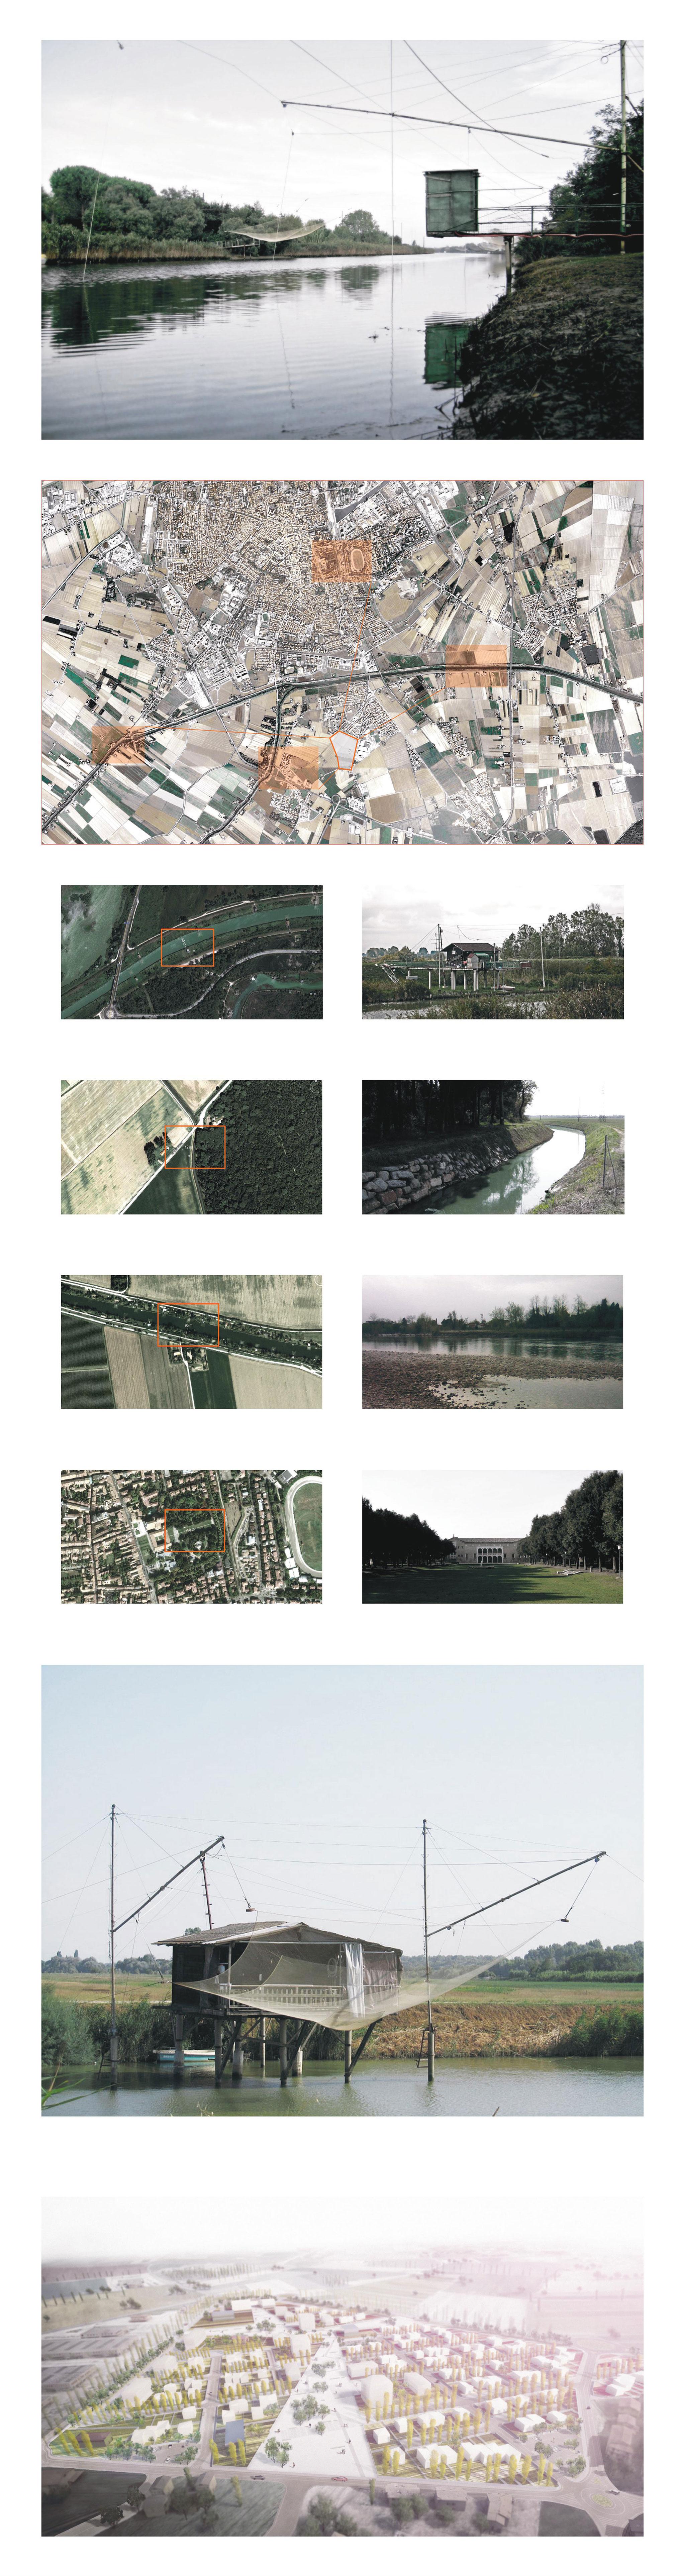 Ravenna-Slide